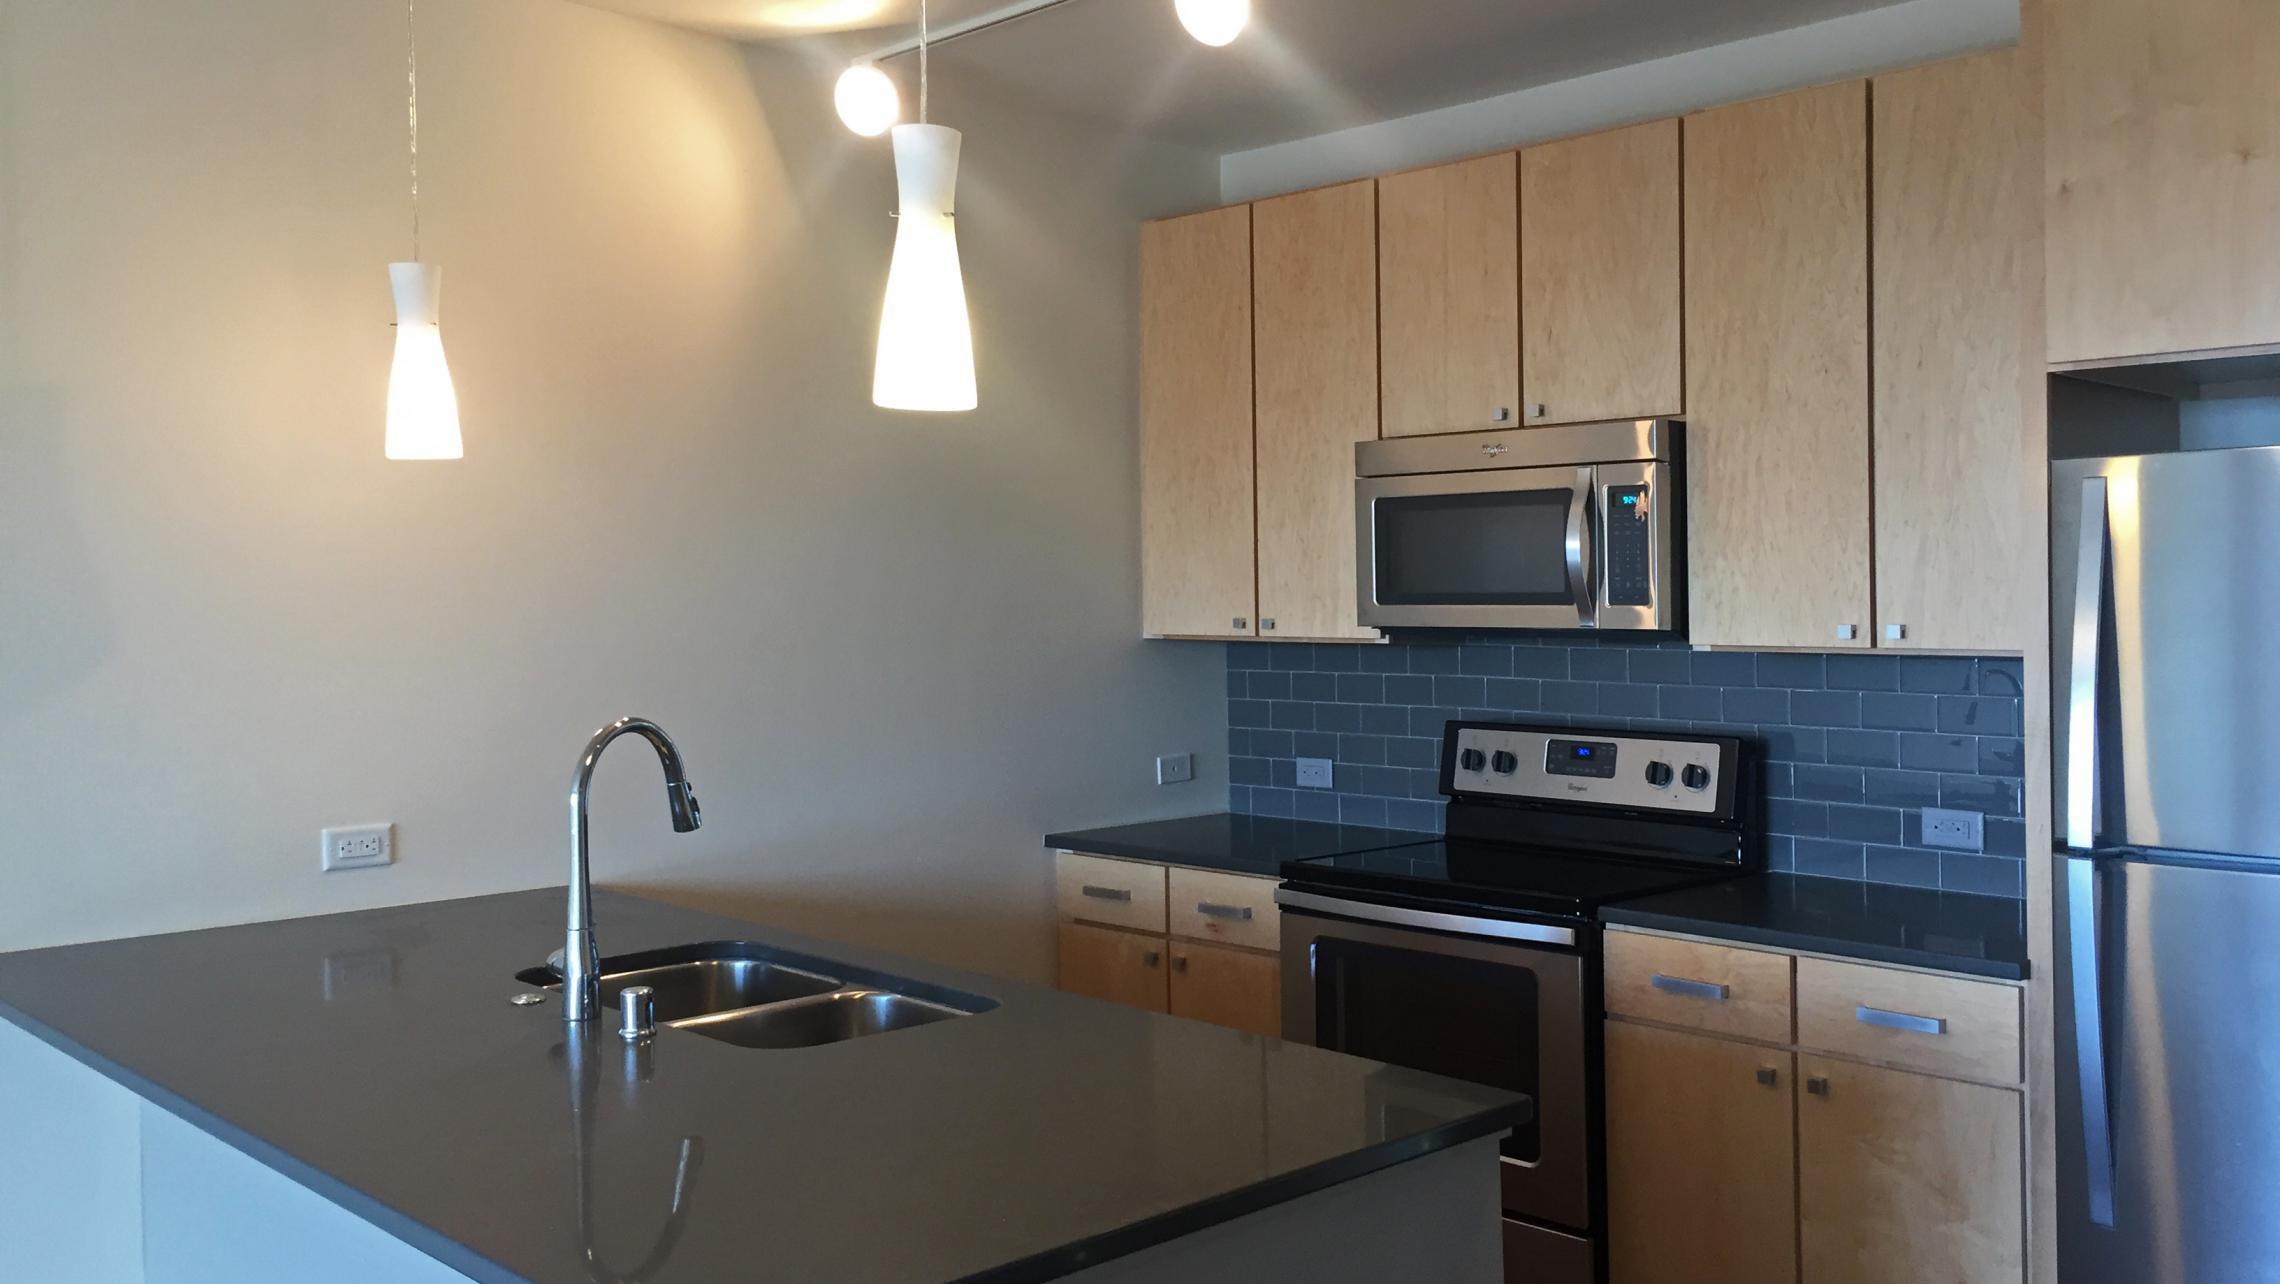 ULI Nine Line Apartments 523 - Kitchen Stainless Steel Appliances